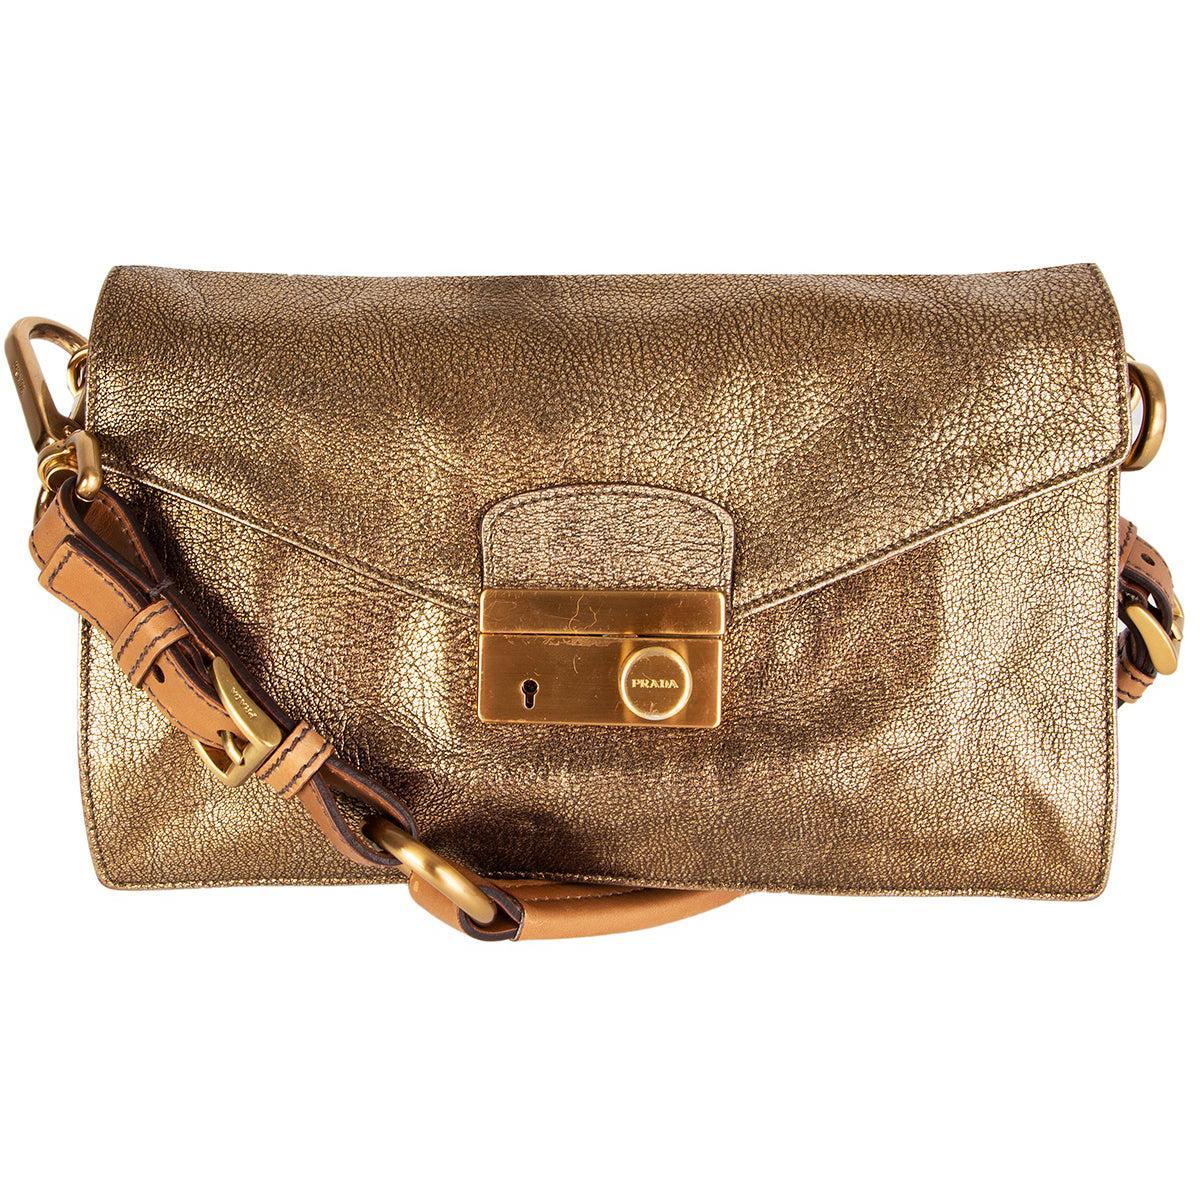 PRADA metallic antique gold leather BERLINO SOUND Shoulder Bag